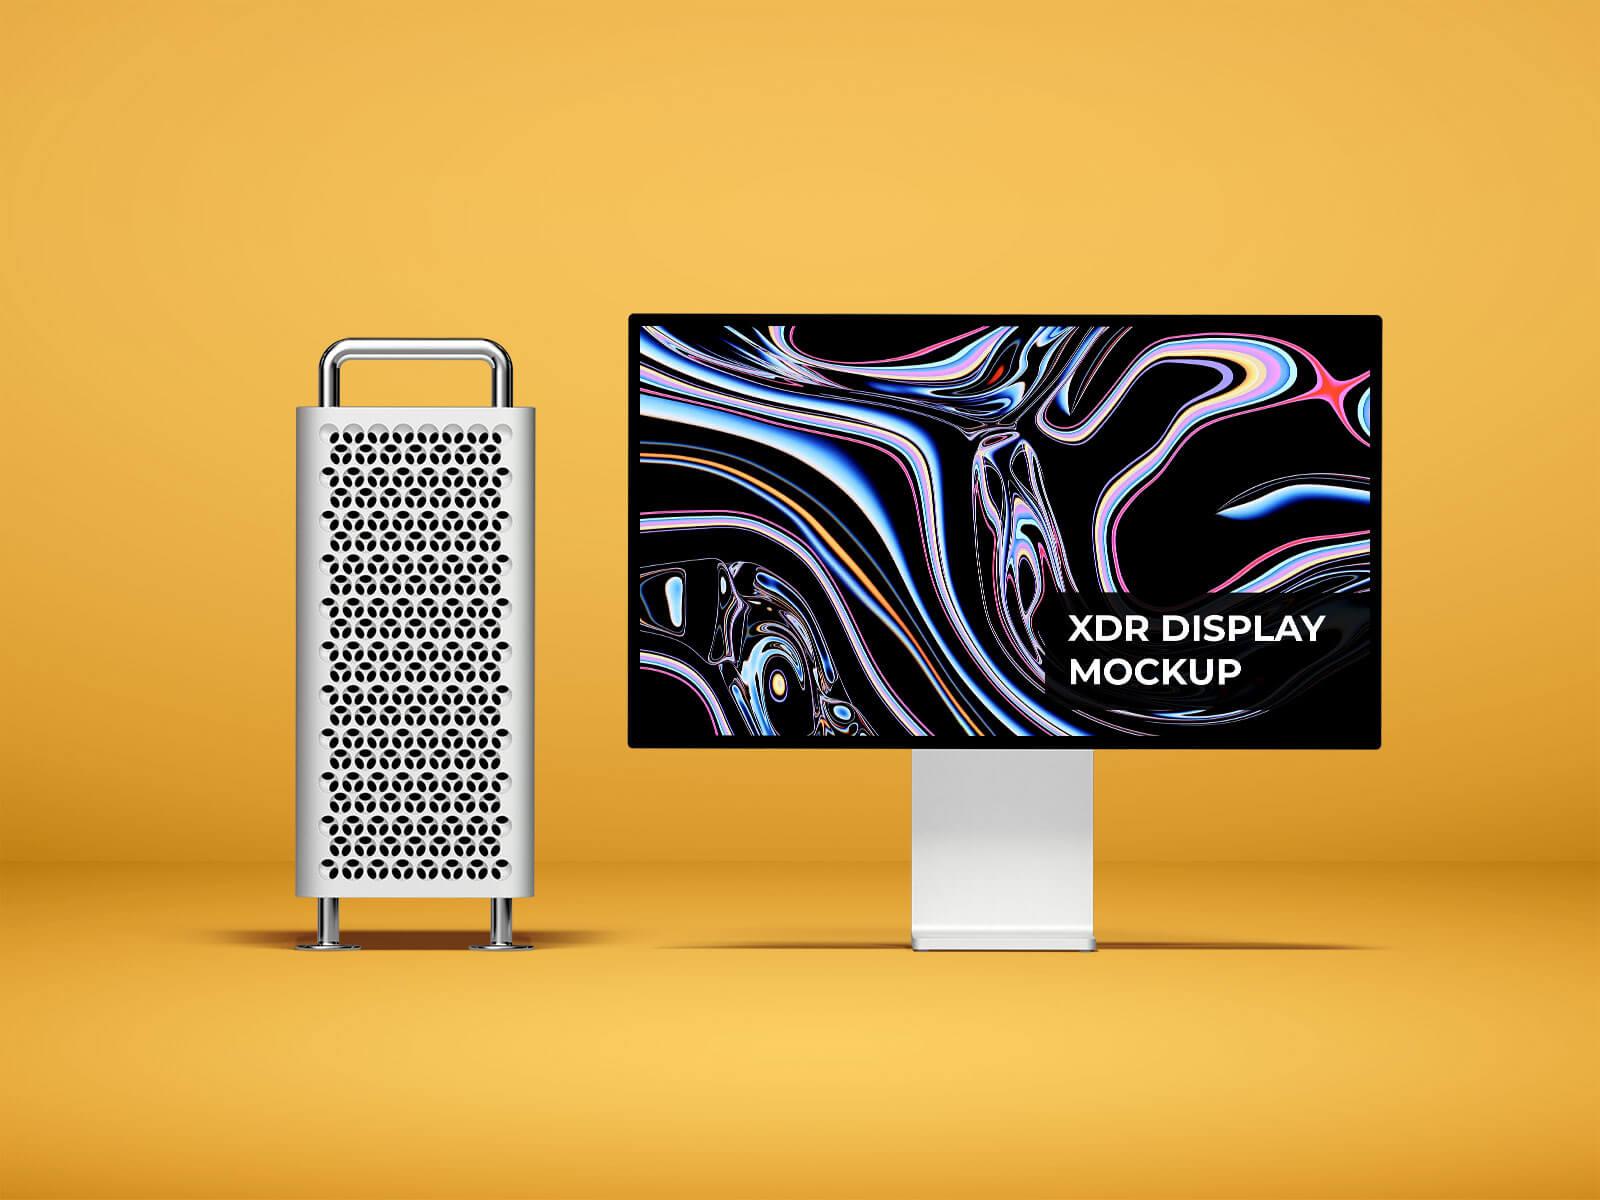 Free-Apple-Pro-Display-XDR-Mockup-PSD-2